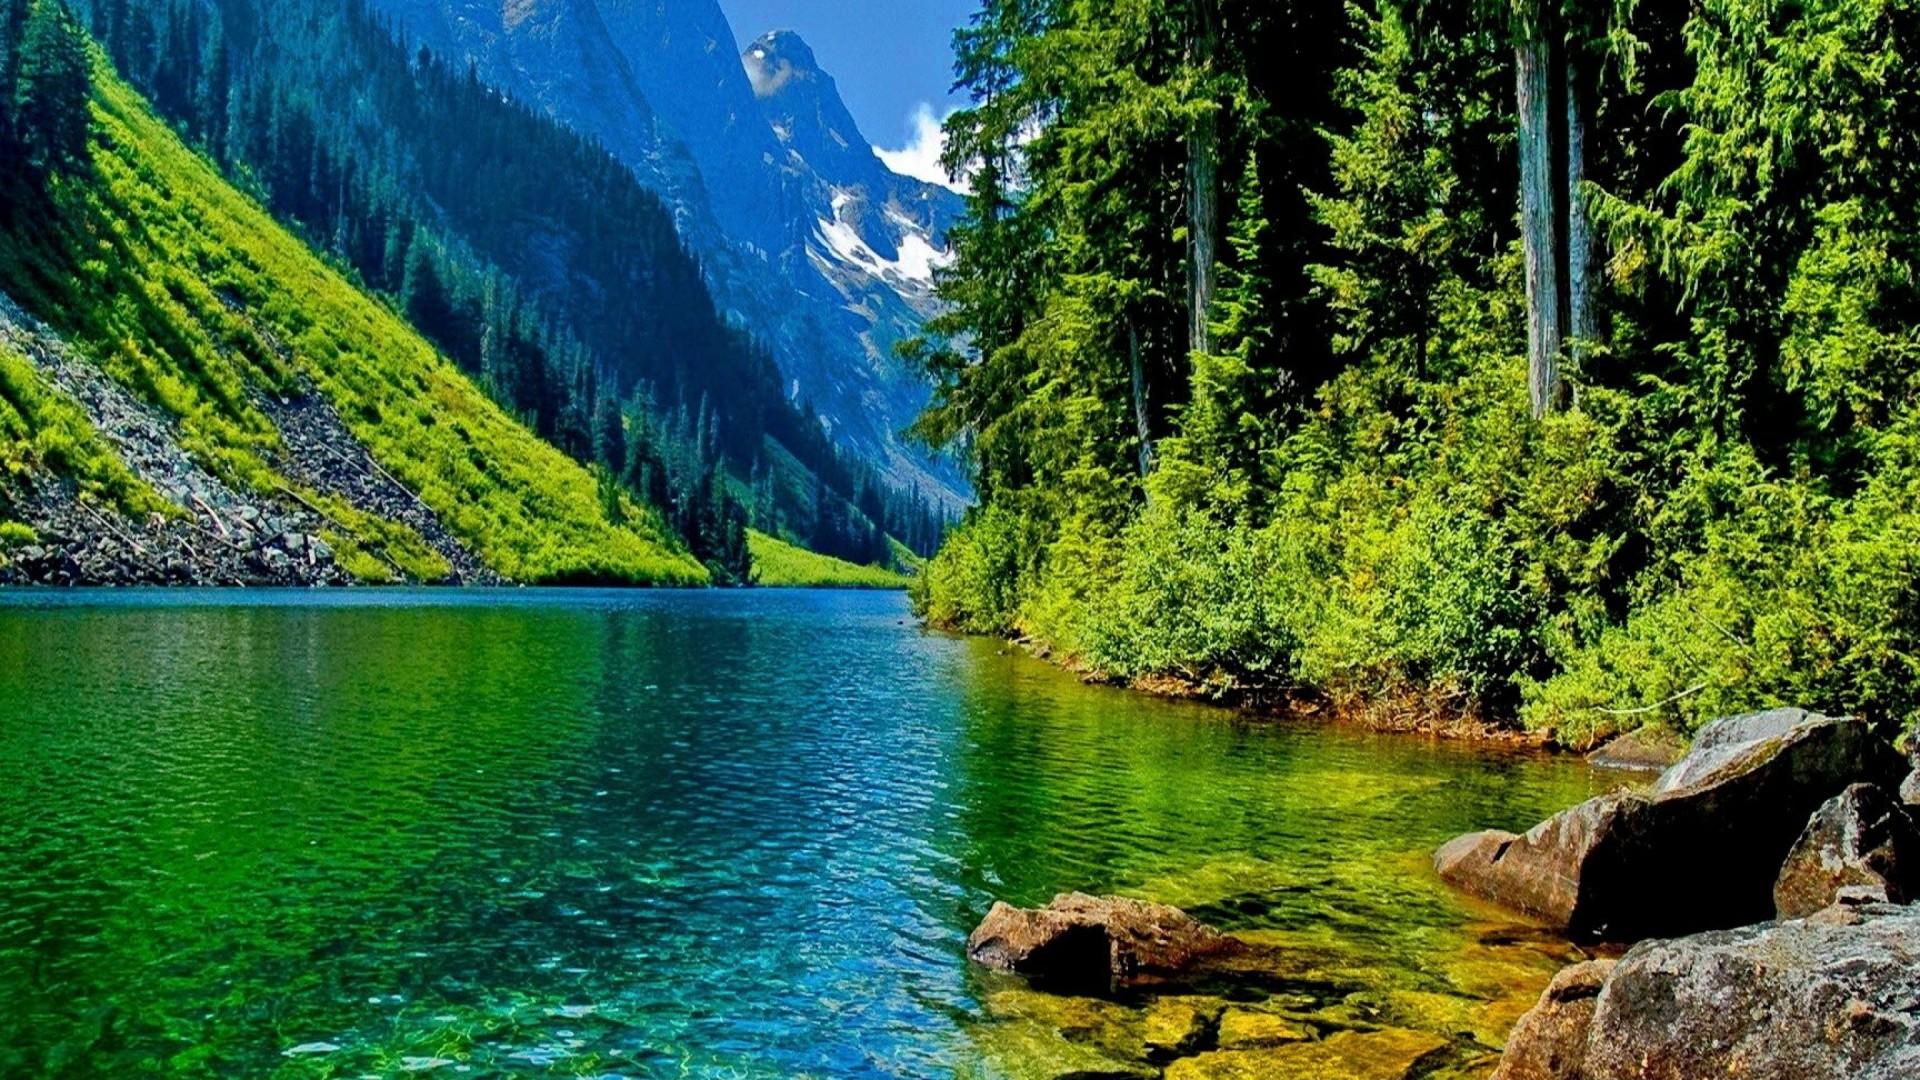 Cool nature photo